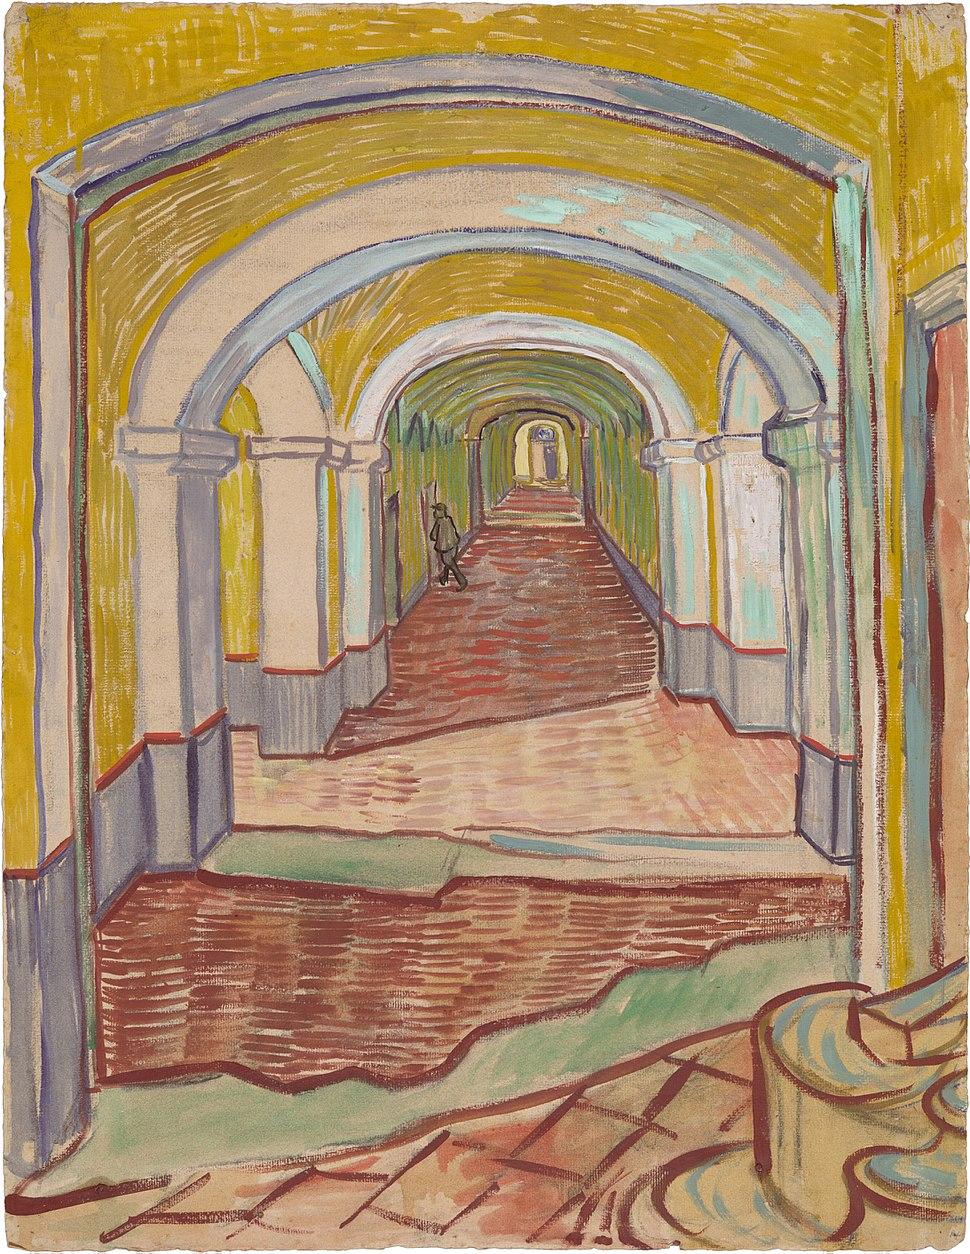 Vincent van Gogh - Corridor in the Asylum